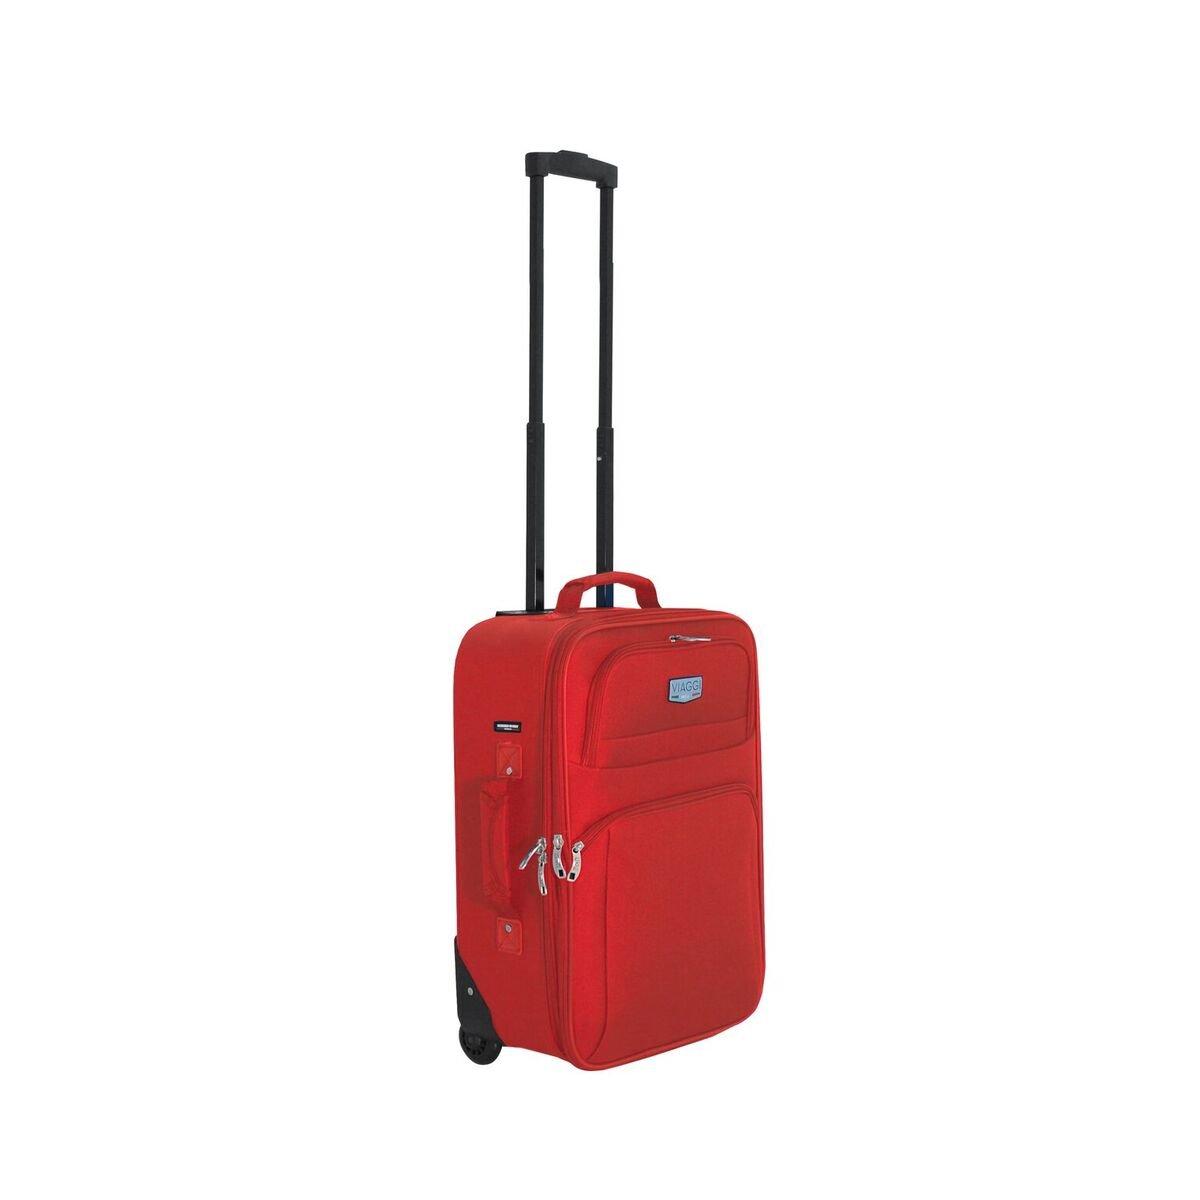 Viaggi 機内持ち込み手荷物, バーガンディー, One Size B0791RY5ZS バーガンディー